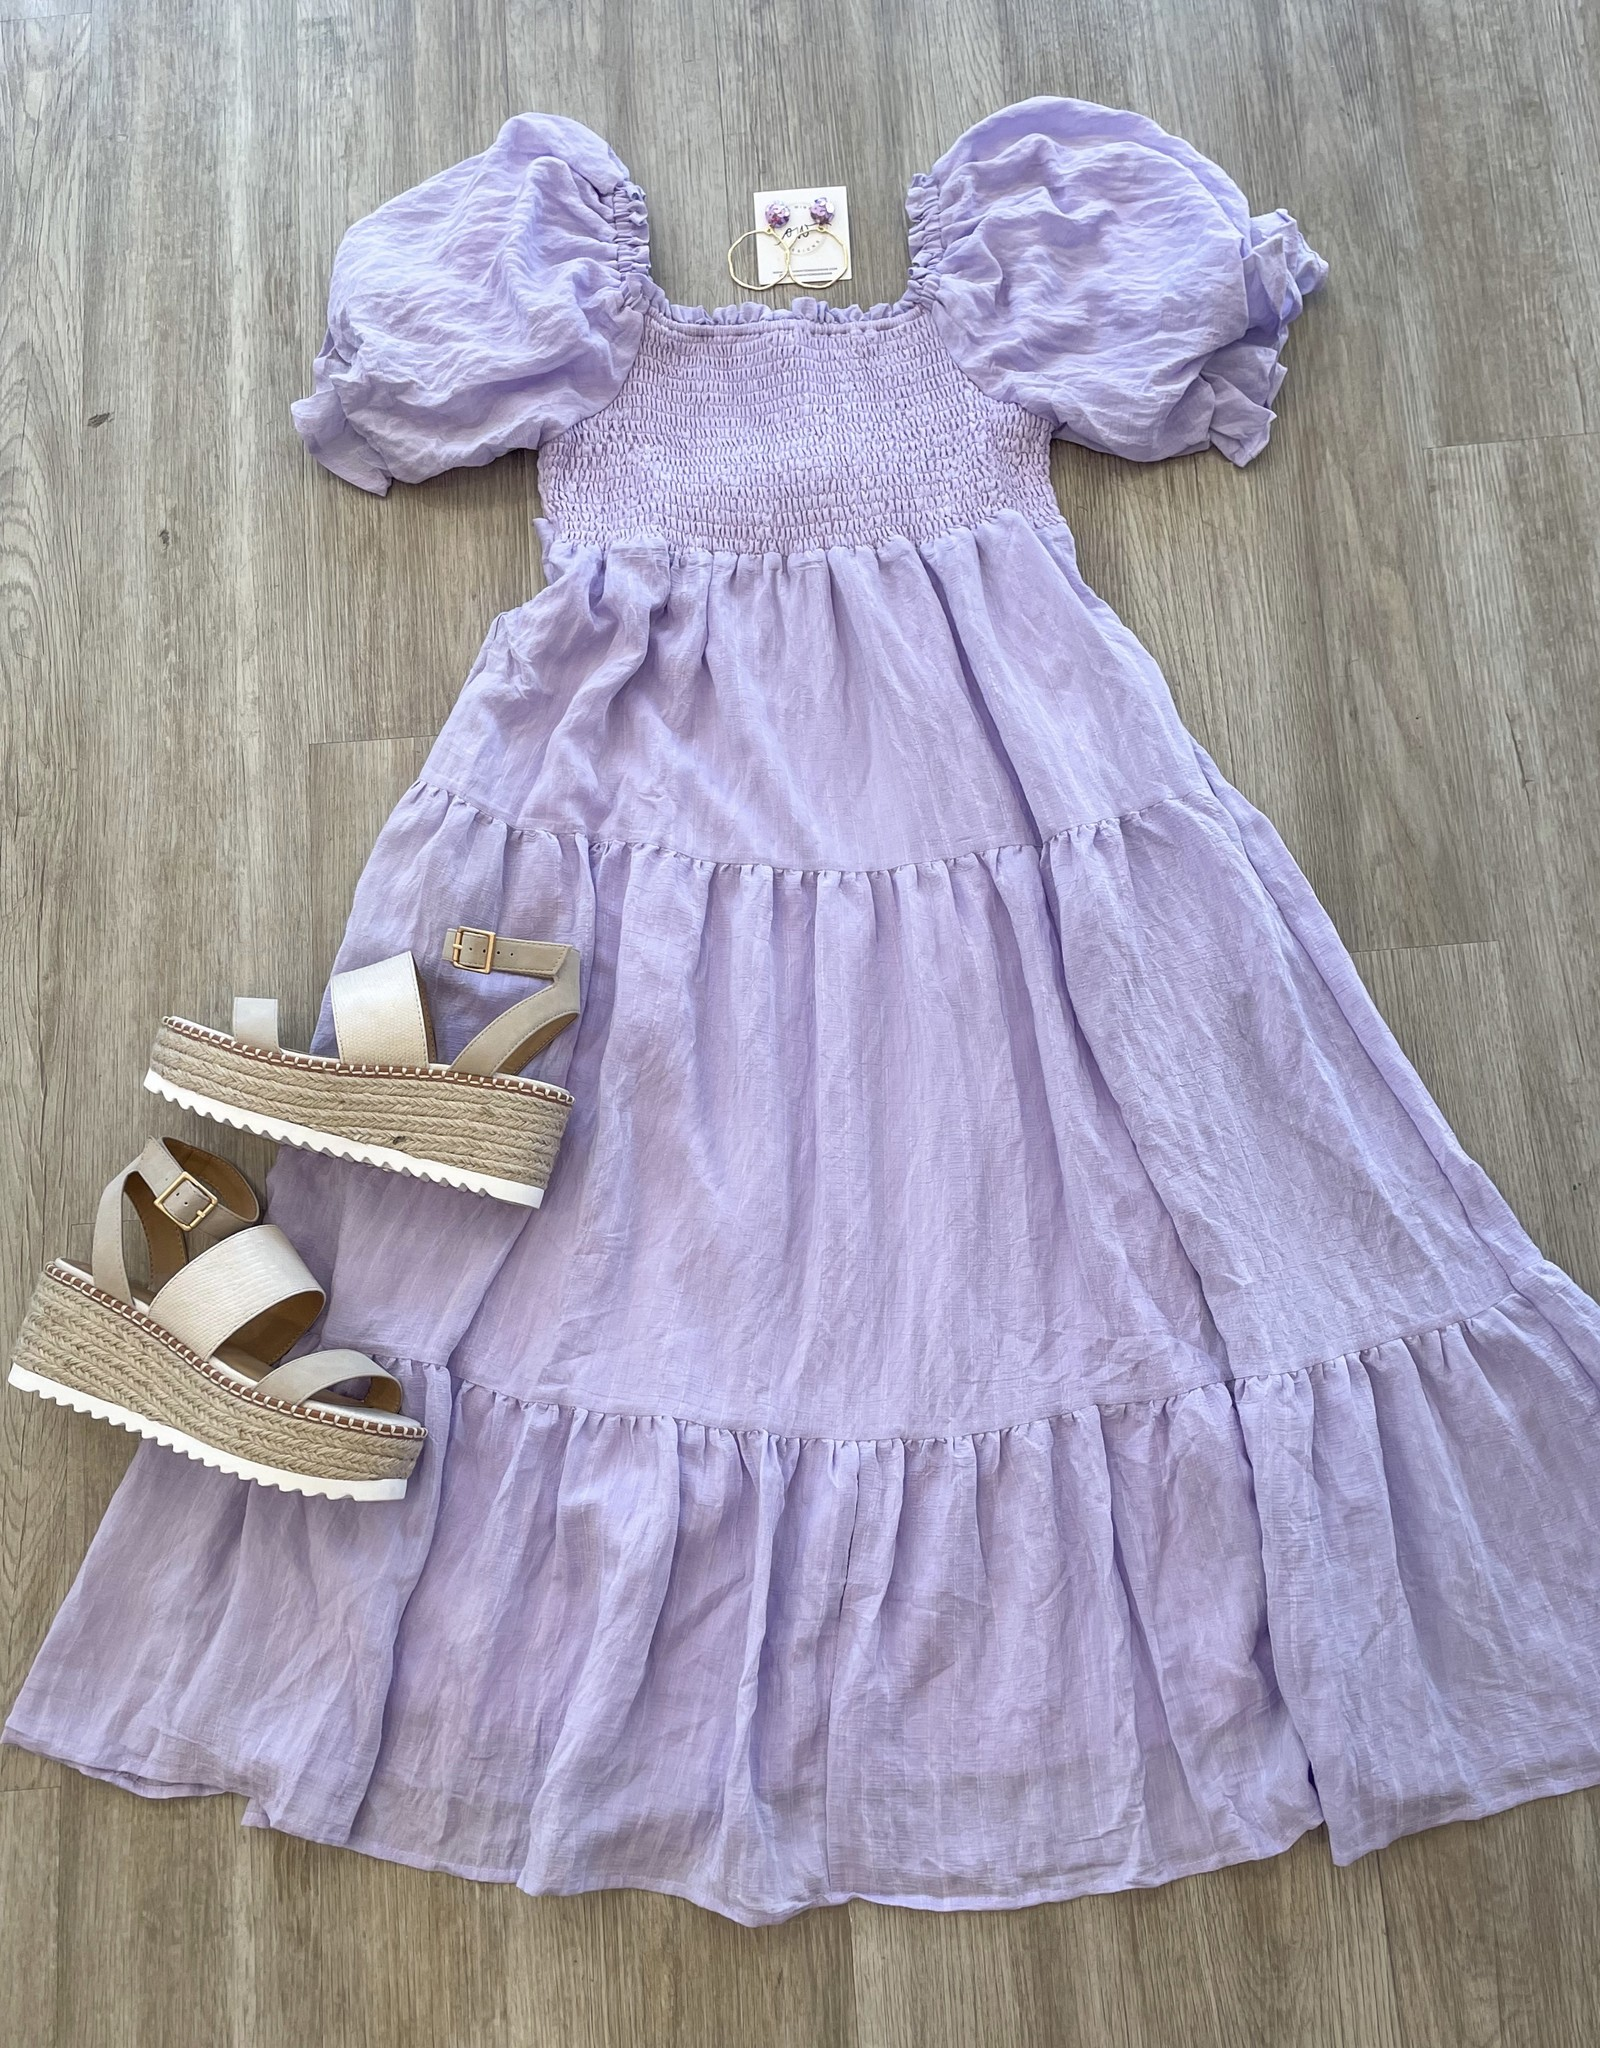 &merci Lavender Dreams Dress